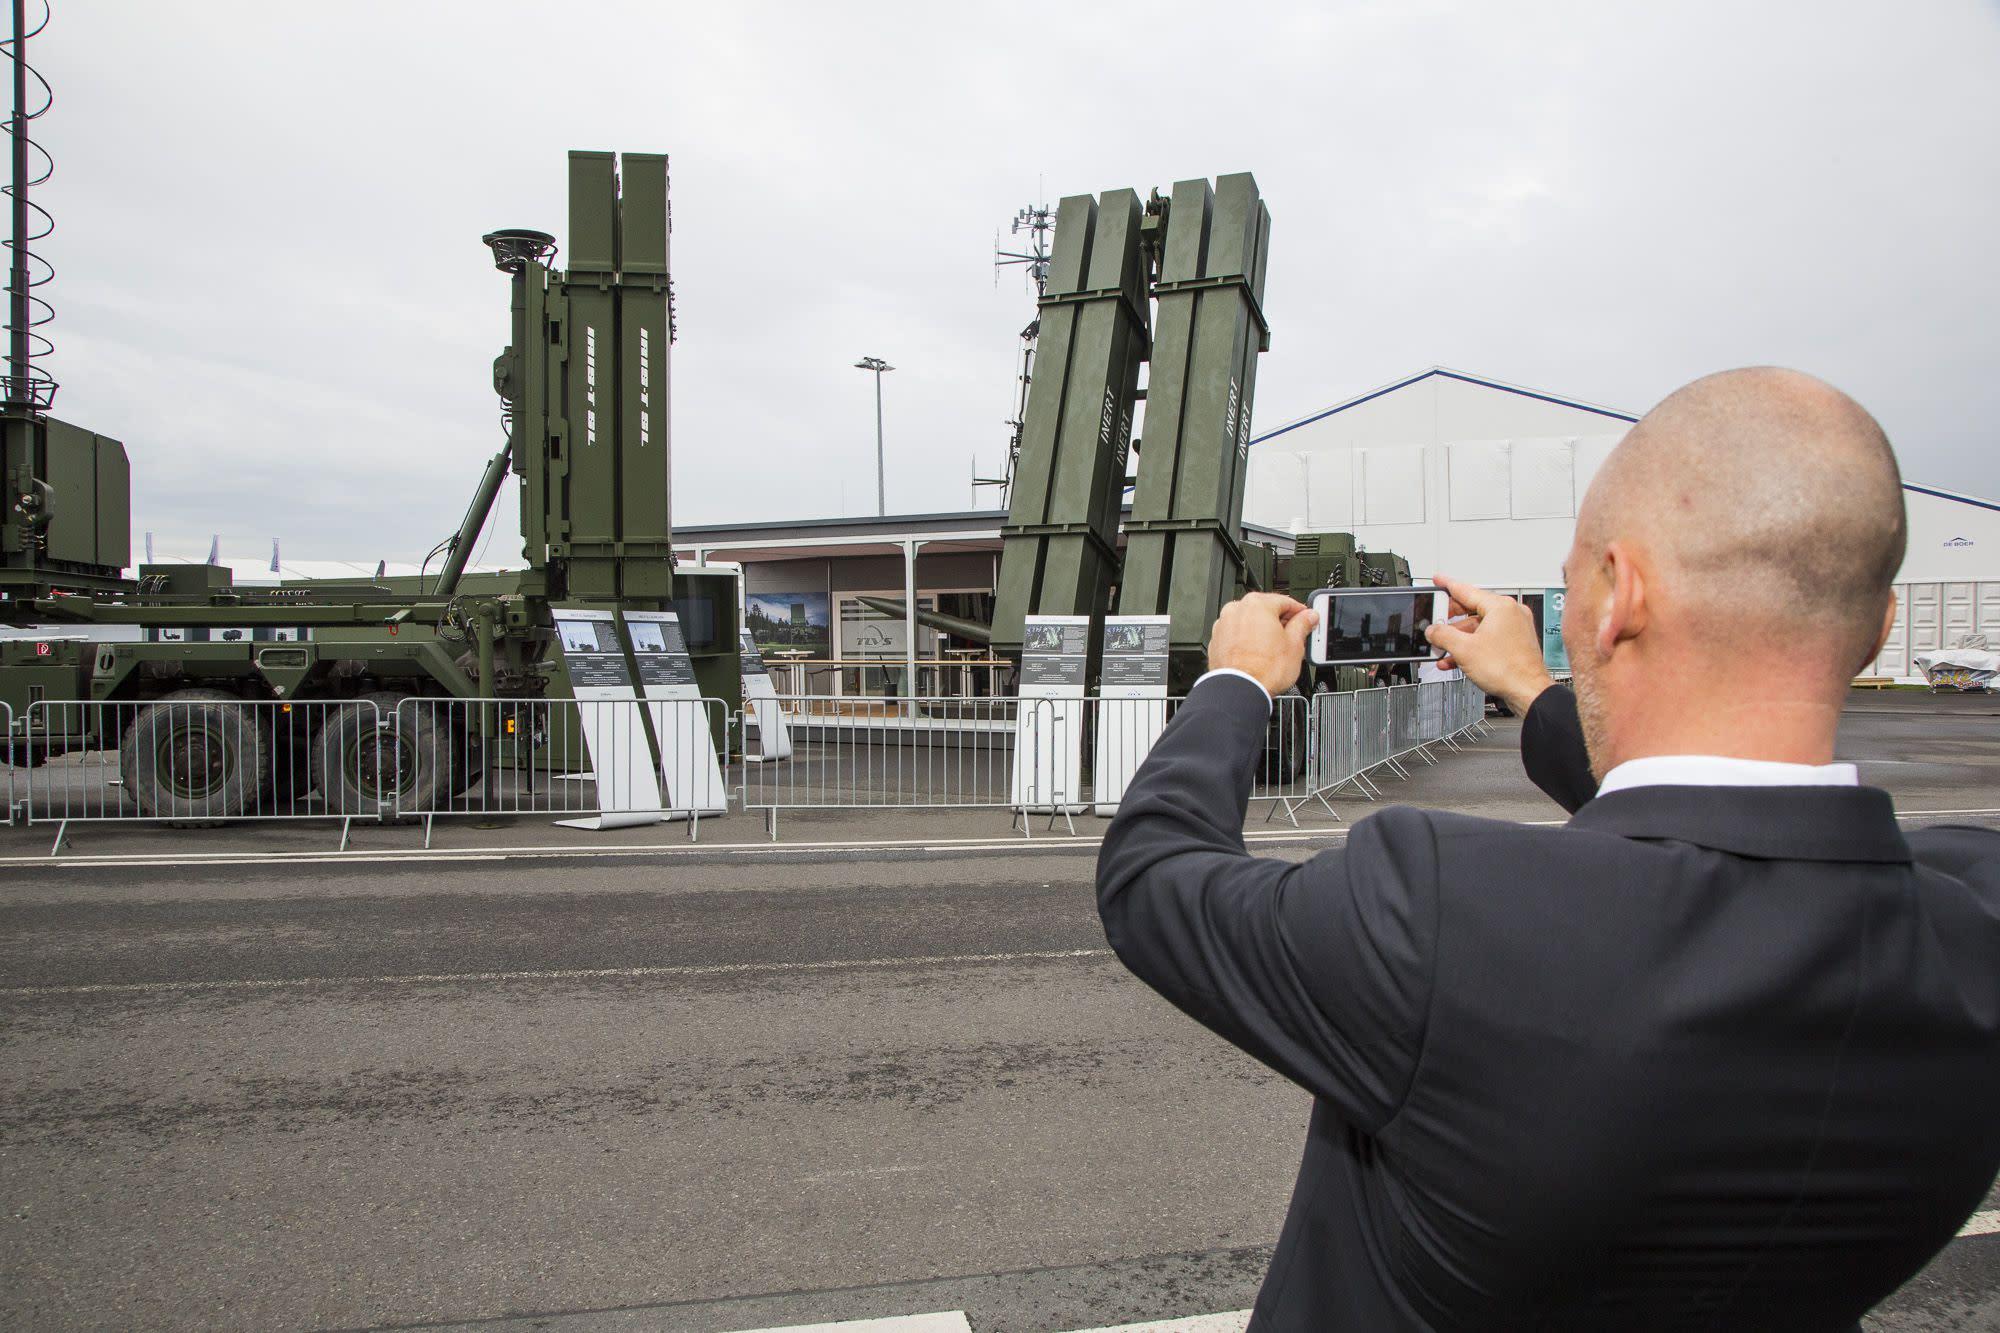 German government asks Lockheed, MBDA to rebid on missile defense system